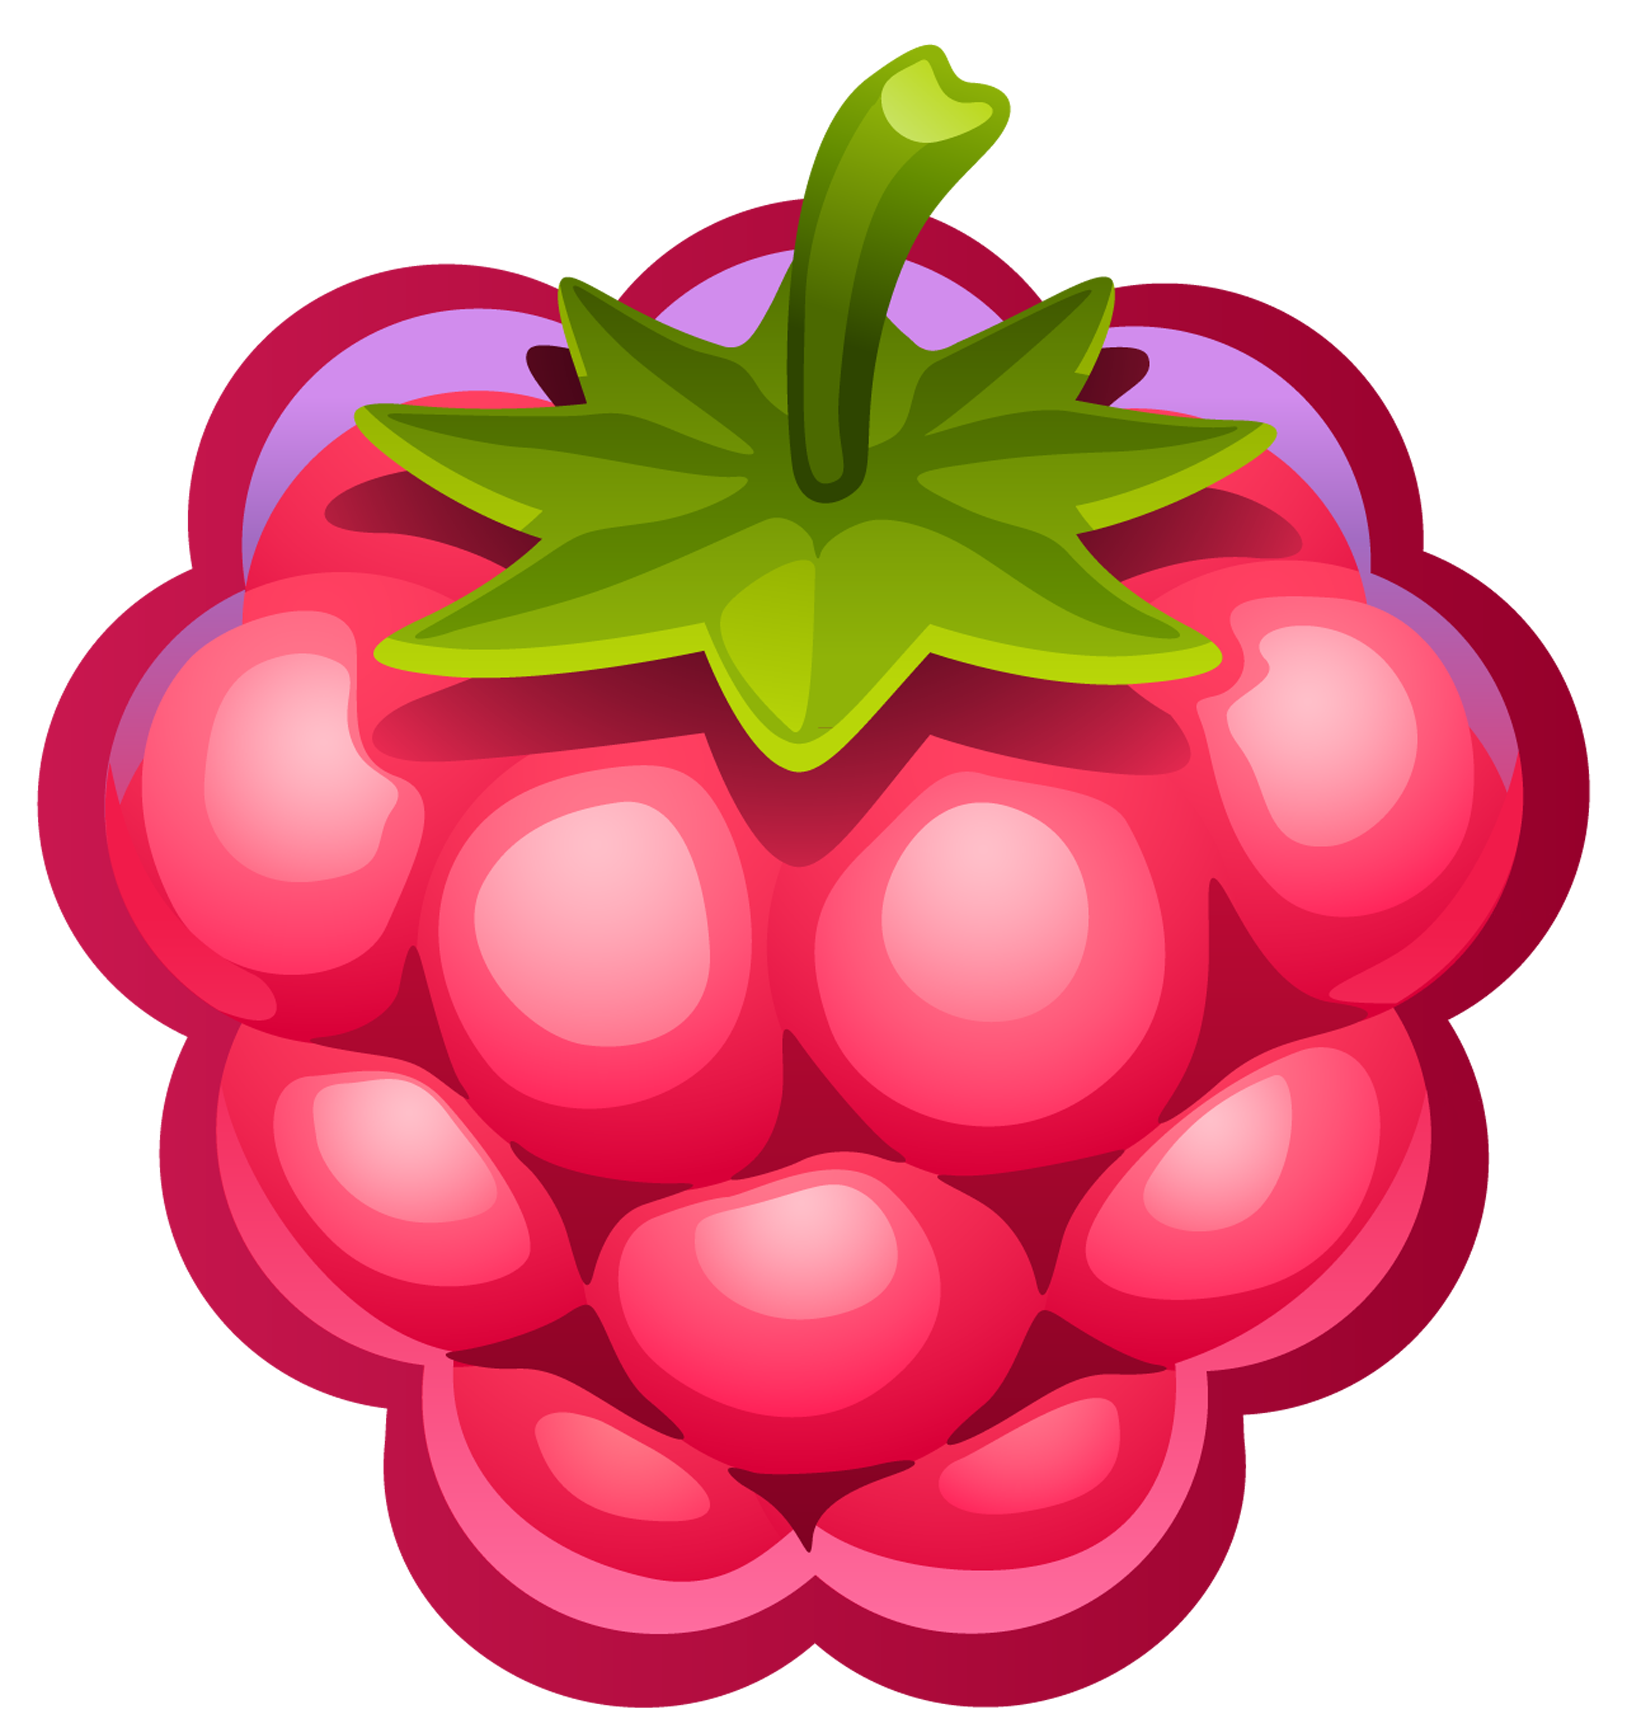 Free Raspberry Cliparts, Download Free Clip Art, Free Clip.